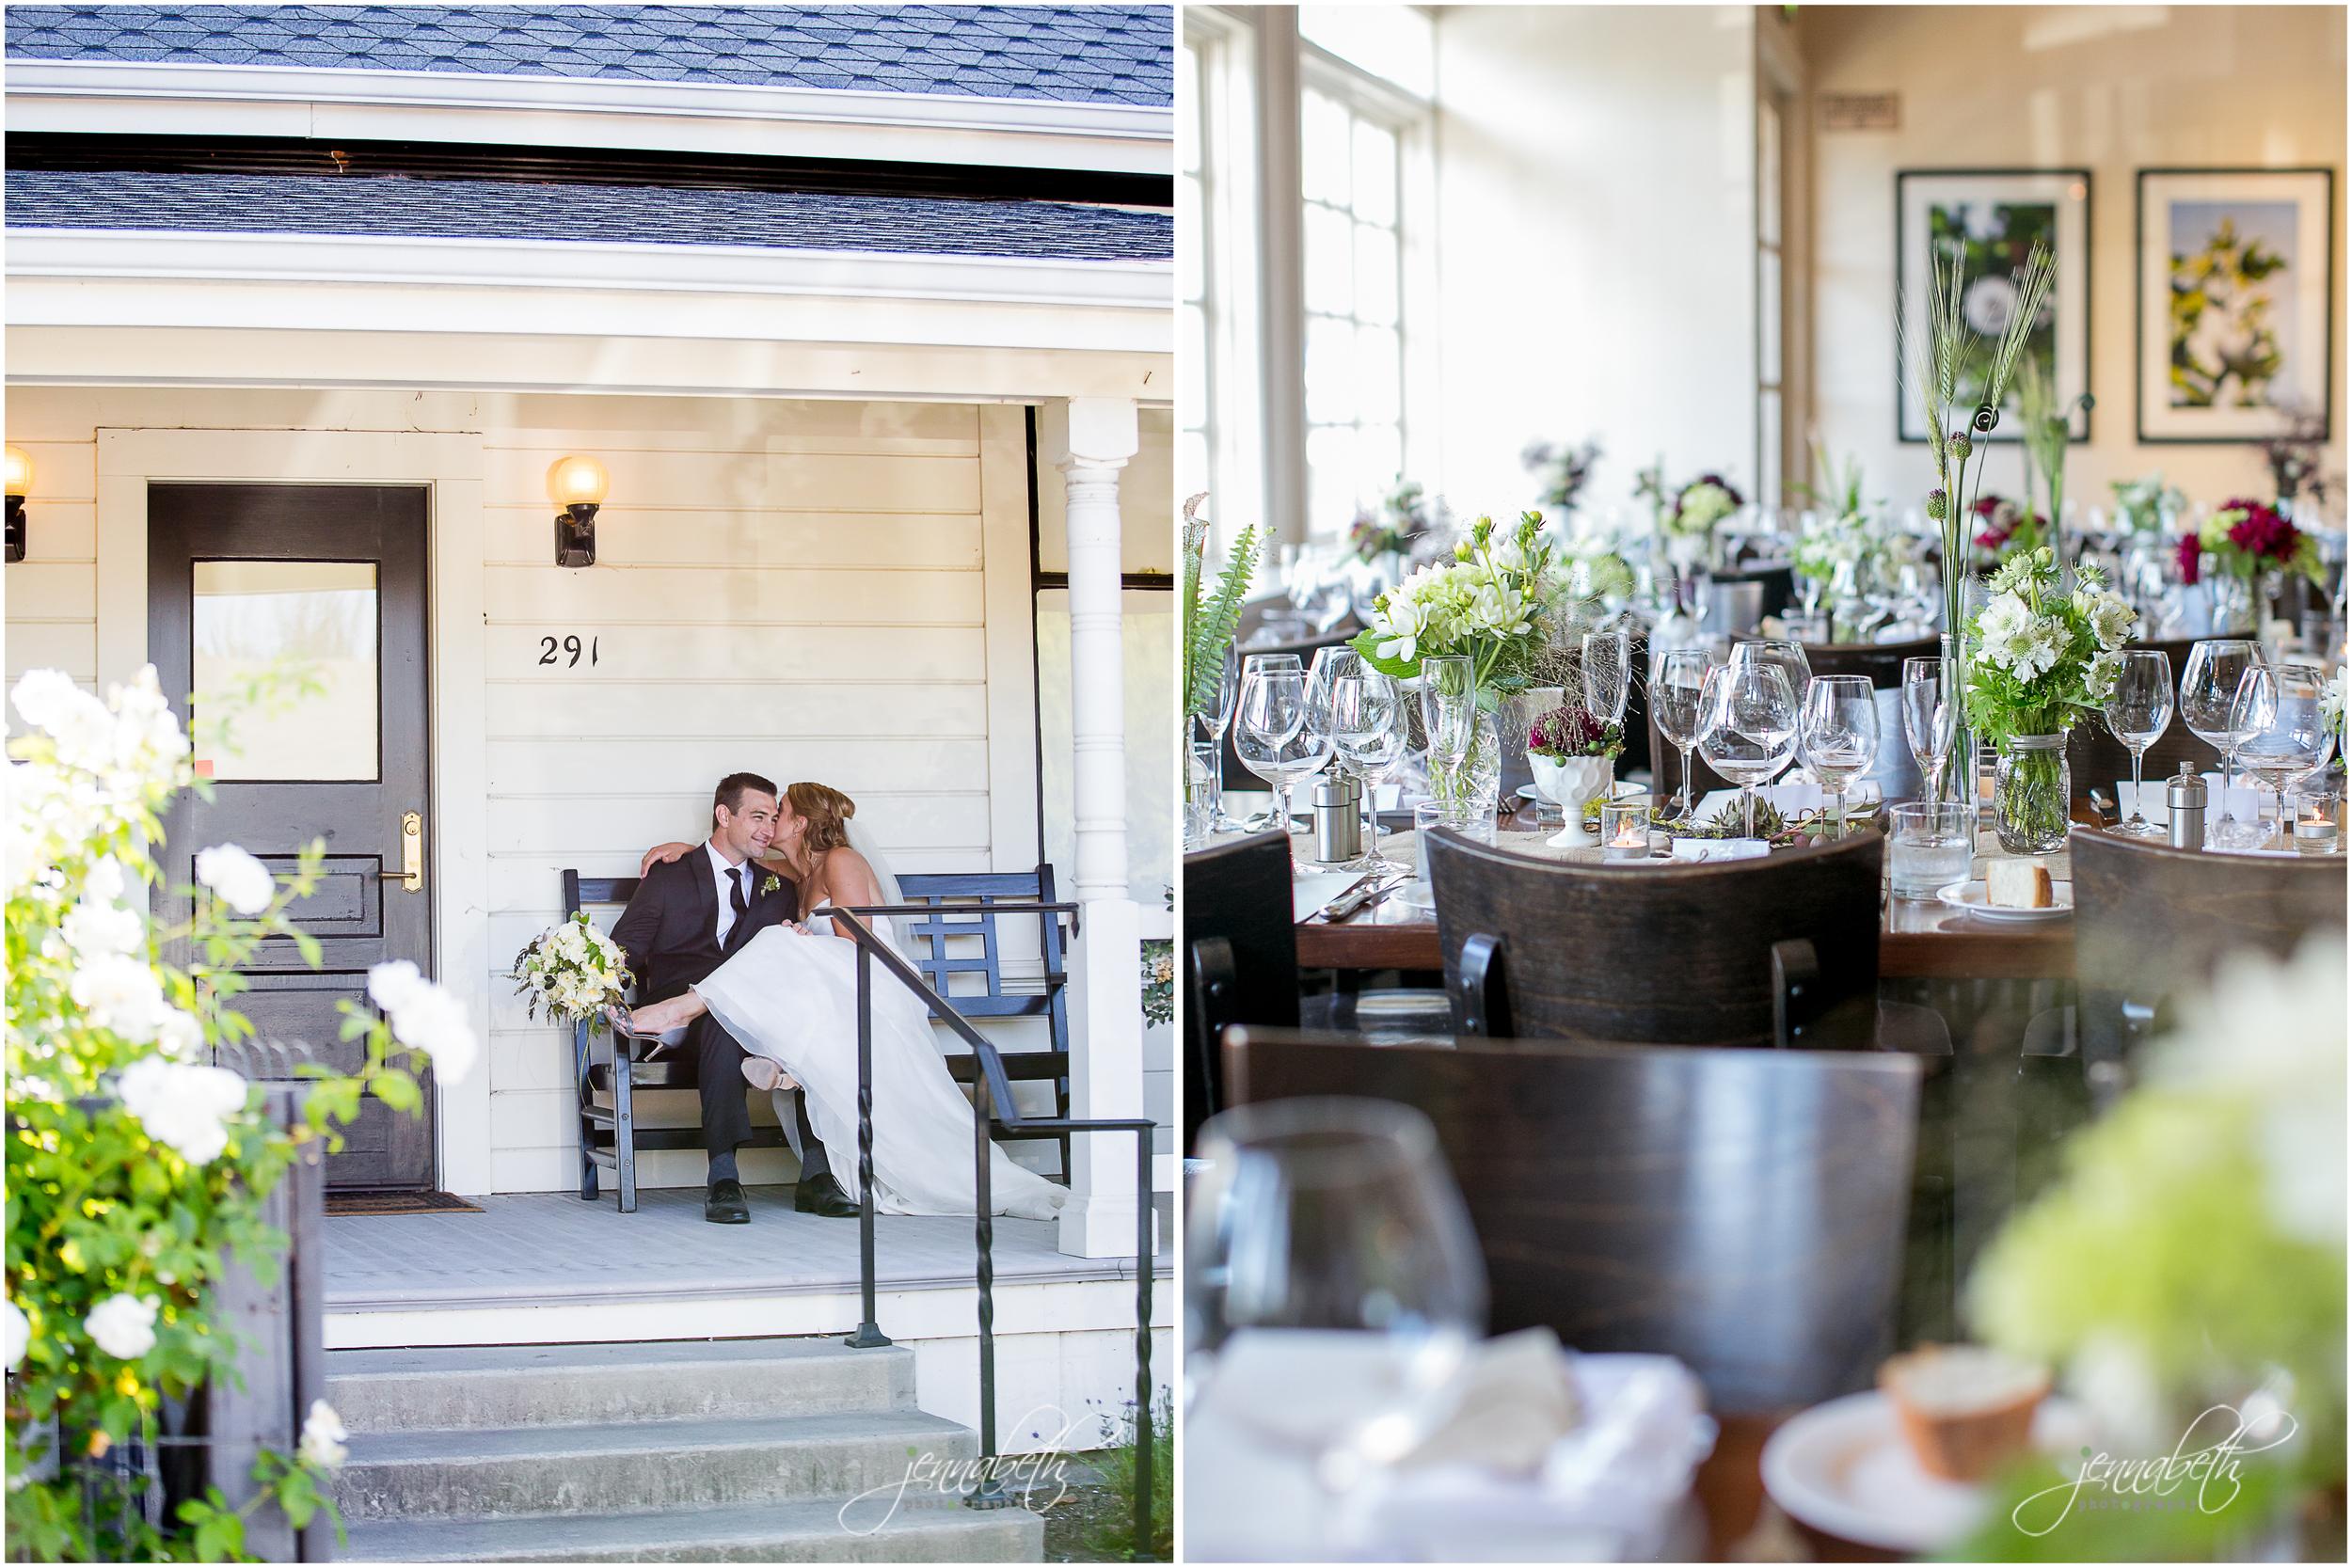 Kari Nick Wedding El Dorado Hotel & Kitchen Wedding